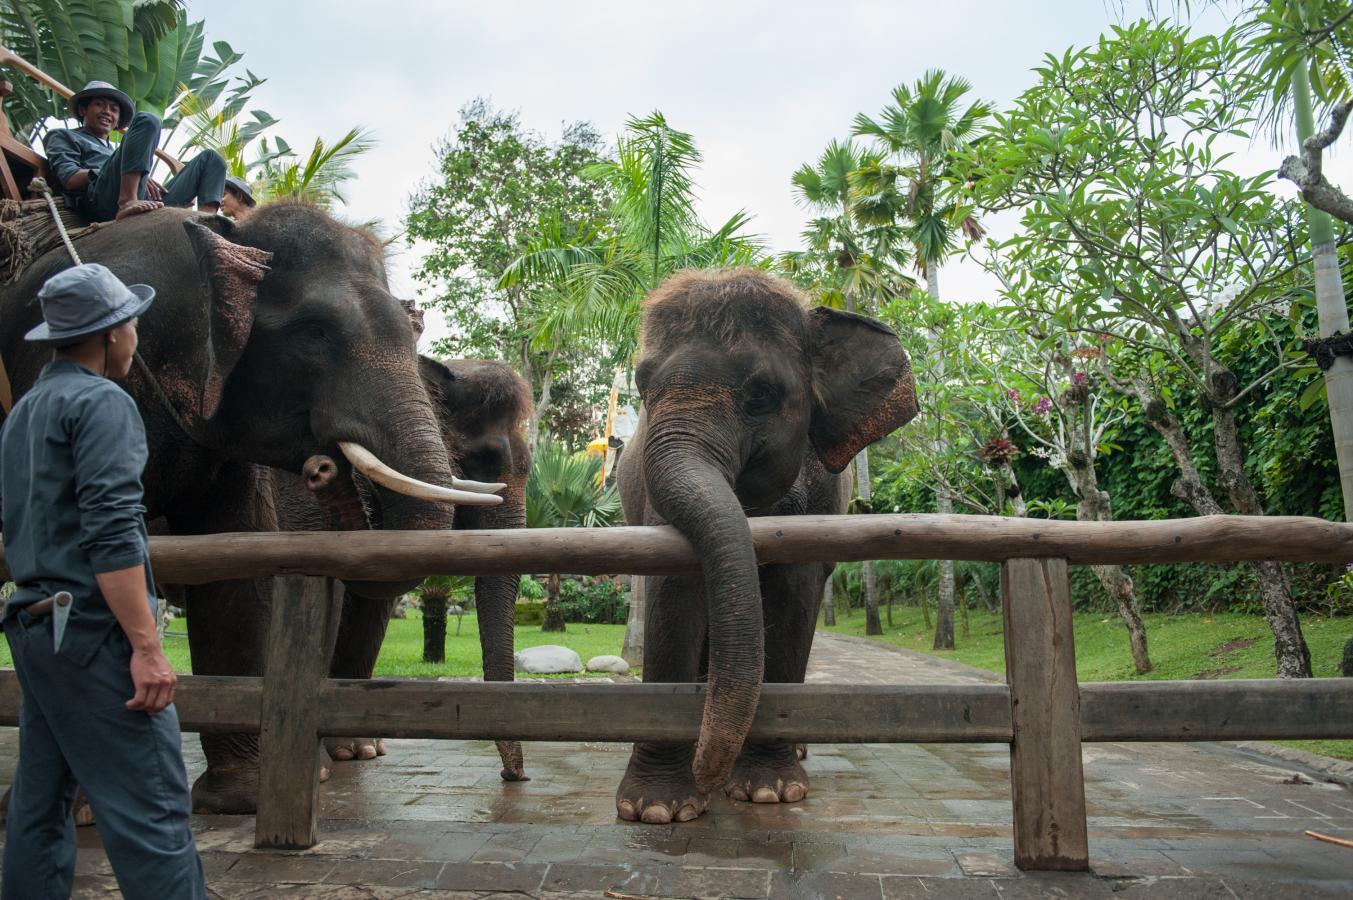 elephants-in-the-bali-zoo-singapadu-bali-2013